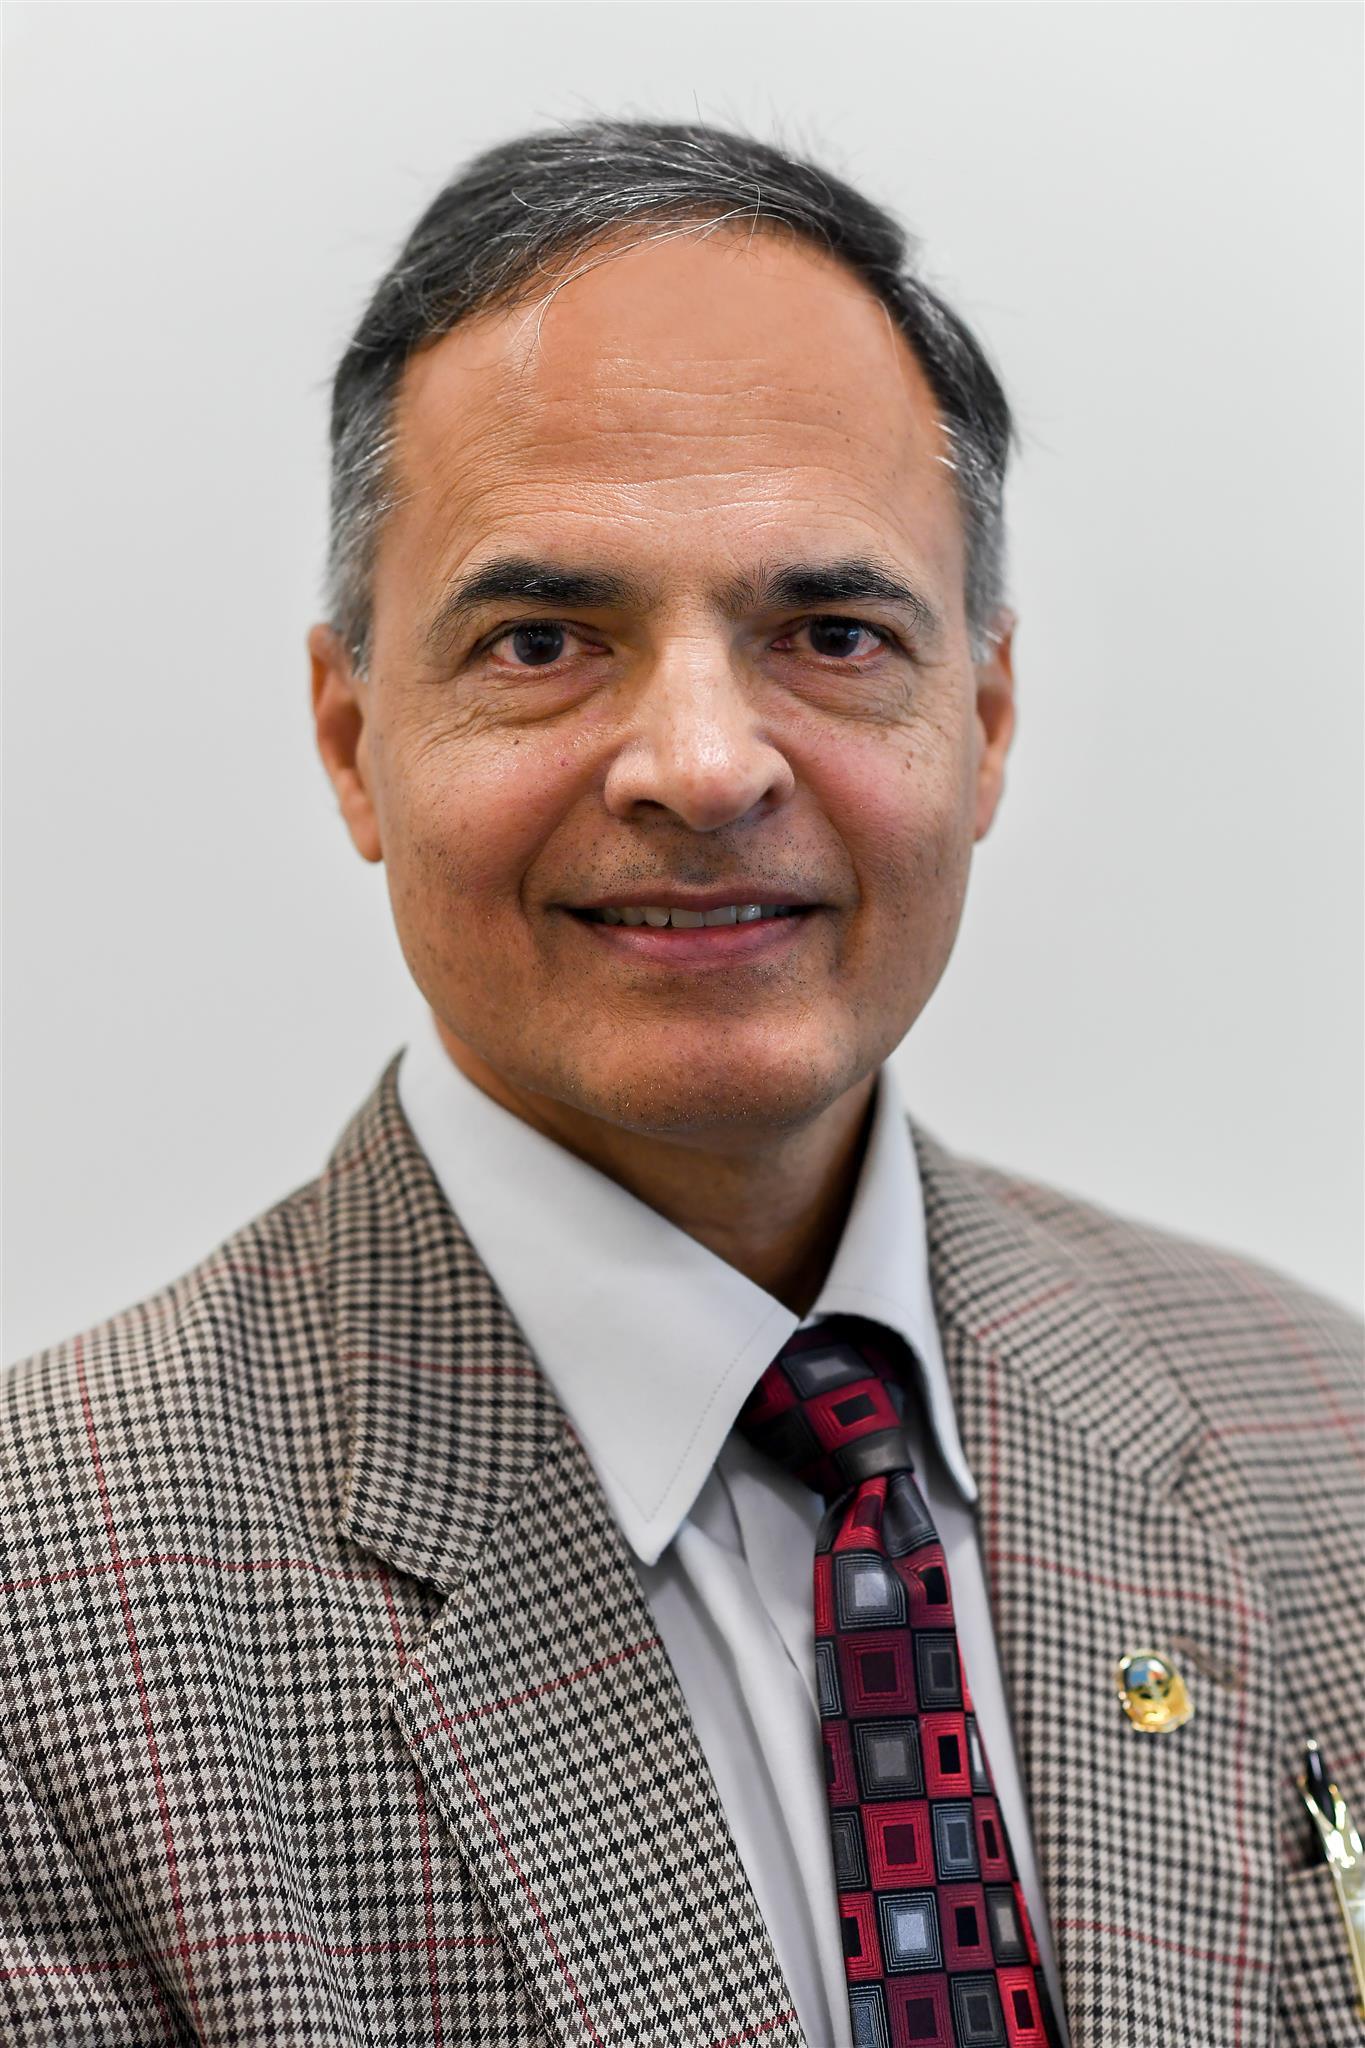 Dr Banu Chowdhary